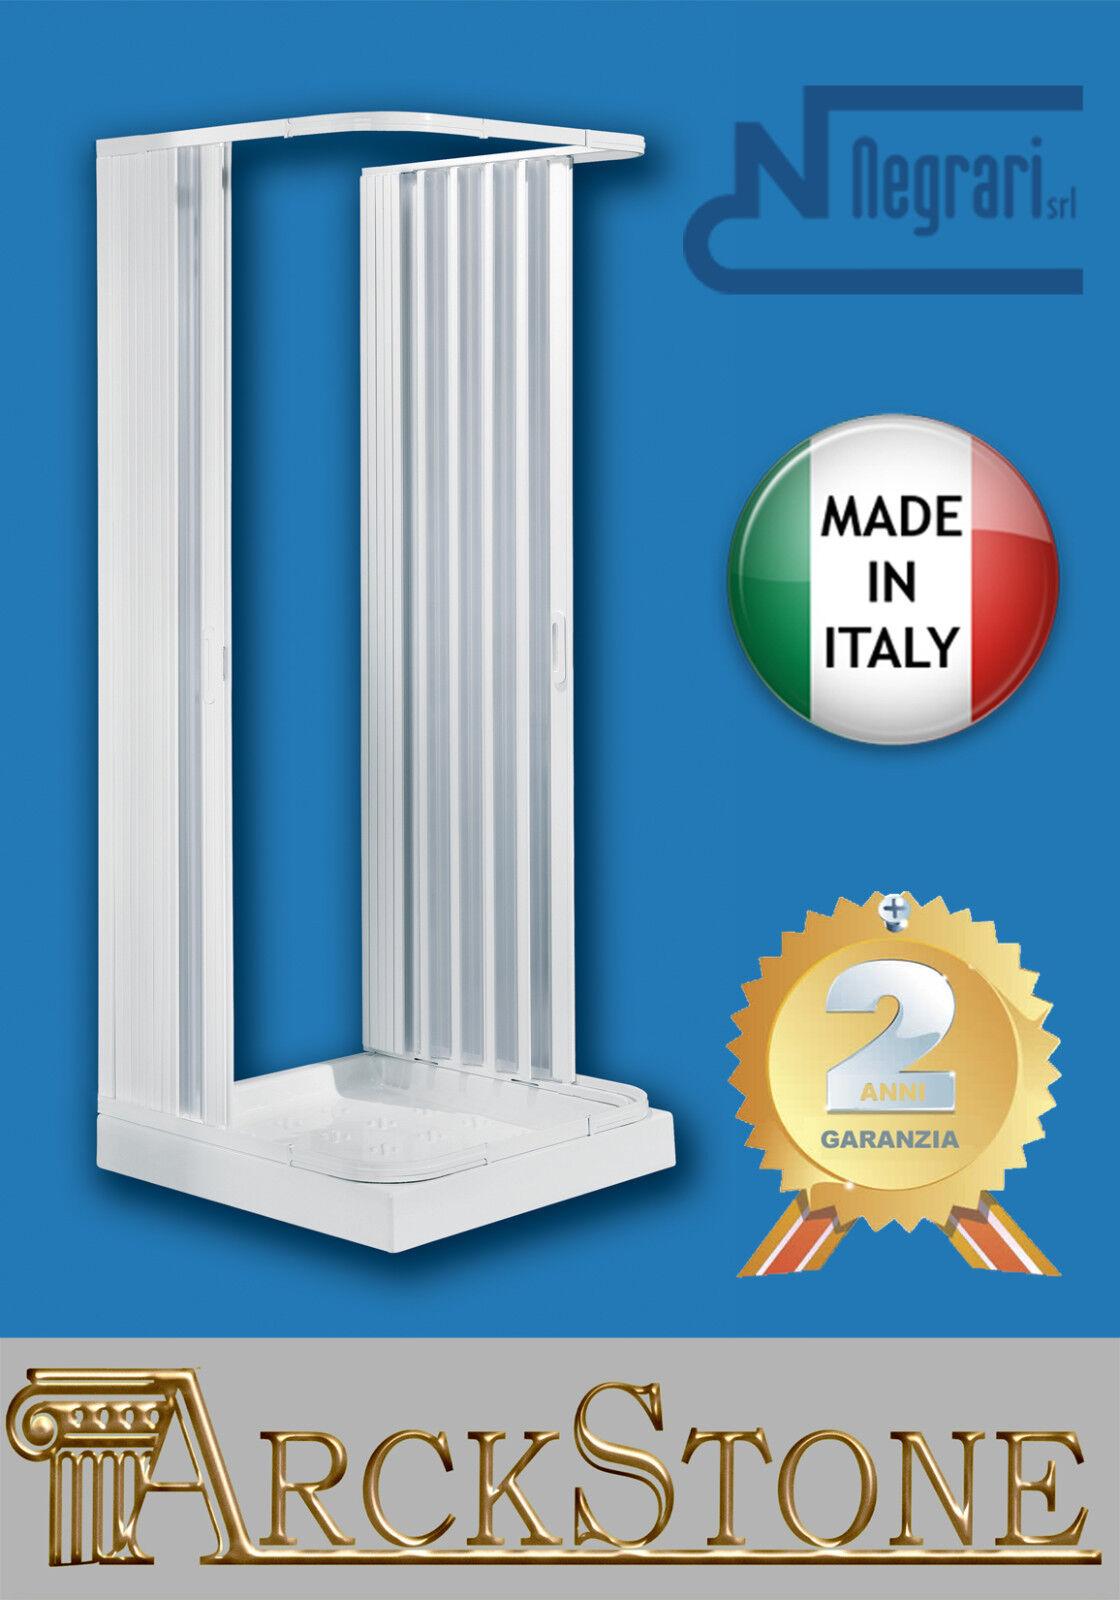 Cabina Box Doccia Negrari Hobby Riducibile Bianco Soffietto 3 Lati 80x80x80 H184